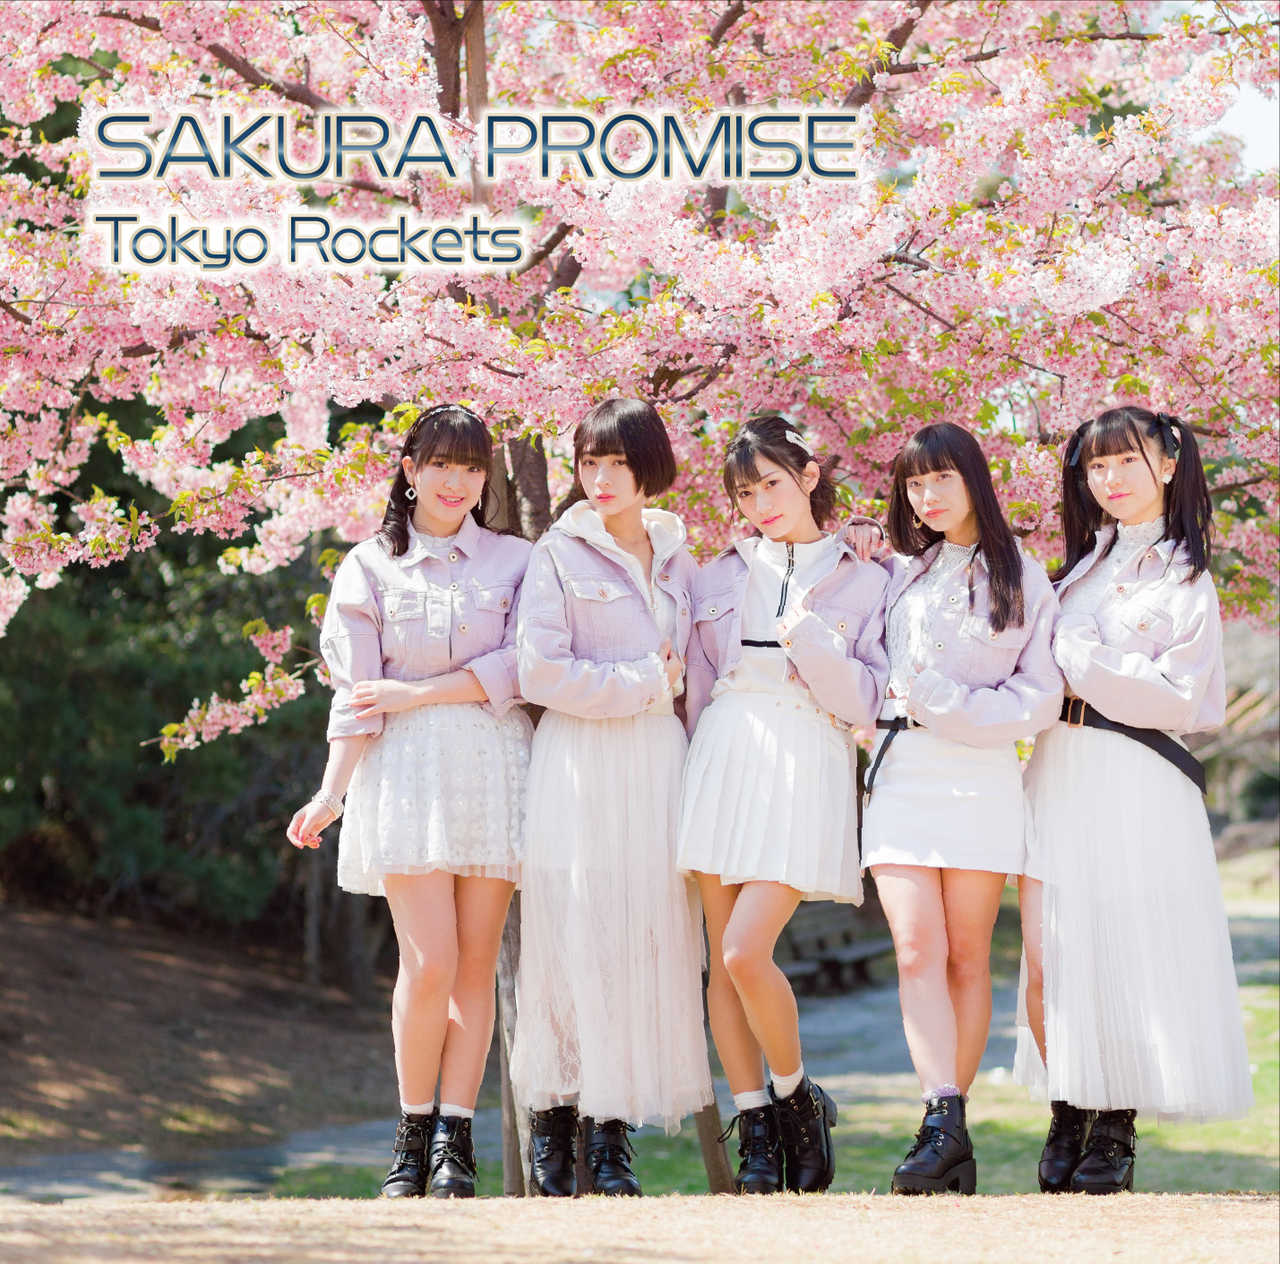 Tokyo Rocketsが5/8に桜をテーマにした新曲「SAKURA PROMISE」をリリース!